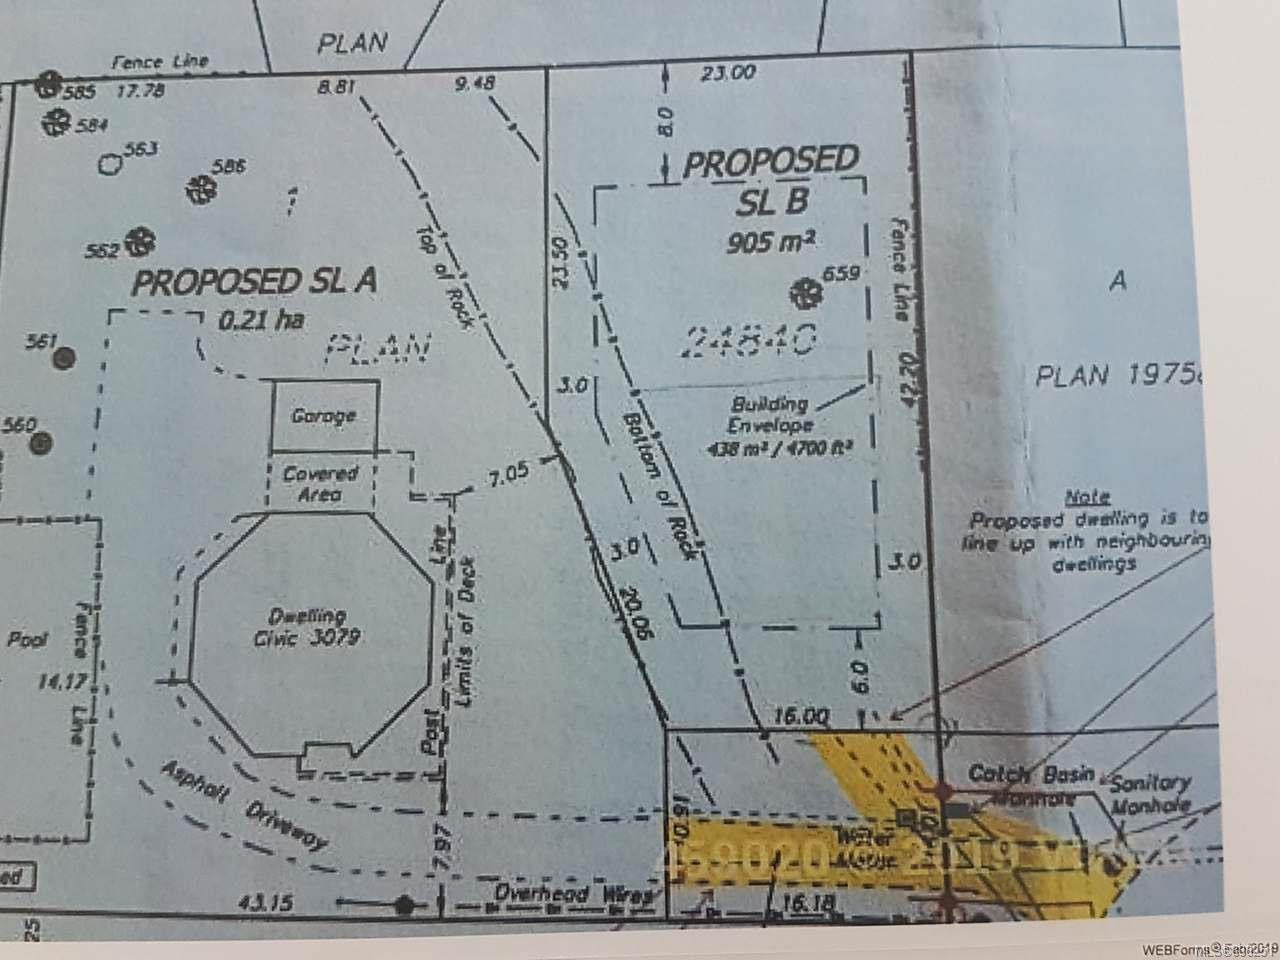 Main Photo: SL-B Hawthorne St in CHEMAINUS: Du Chemainus Land for sale (Duncan)  : MLS®# 838251